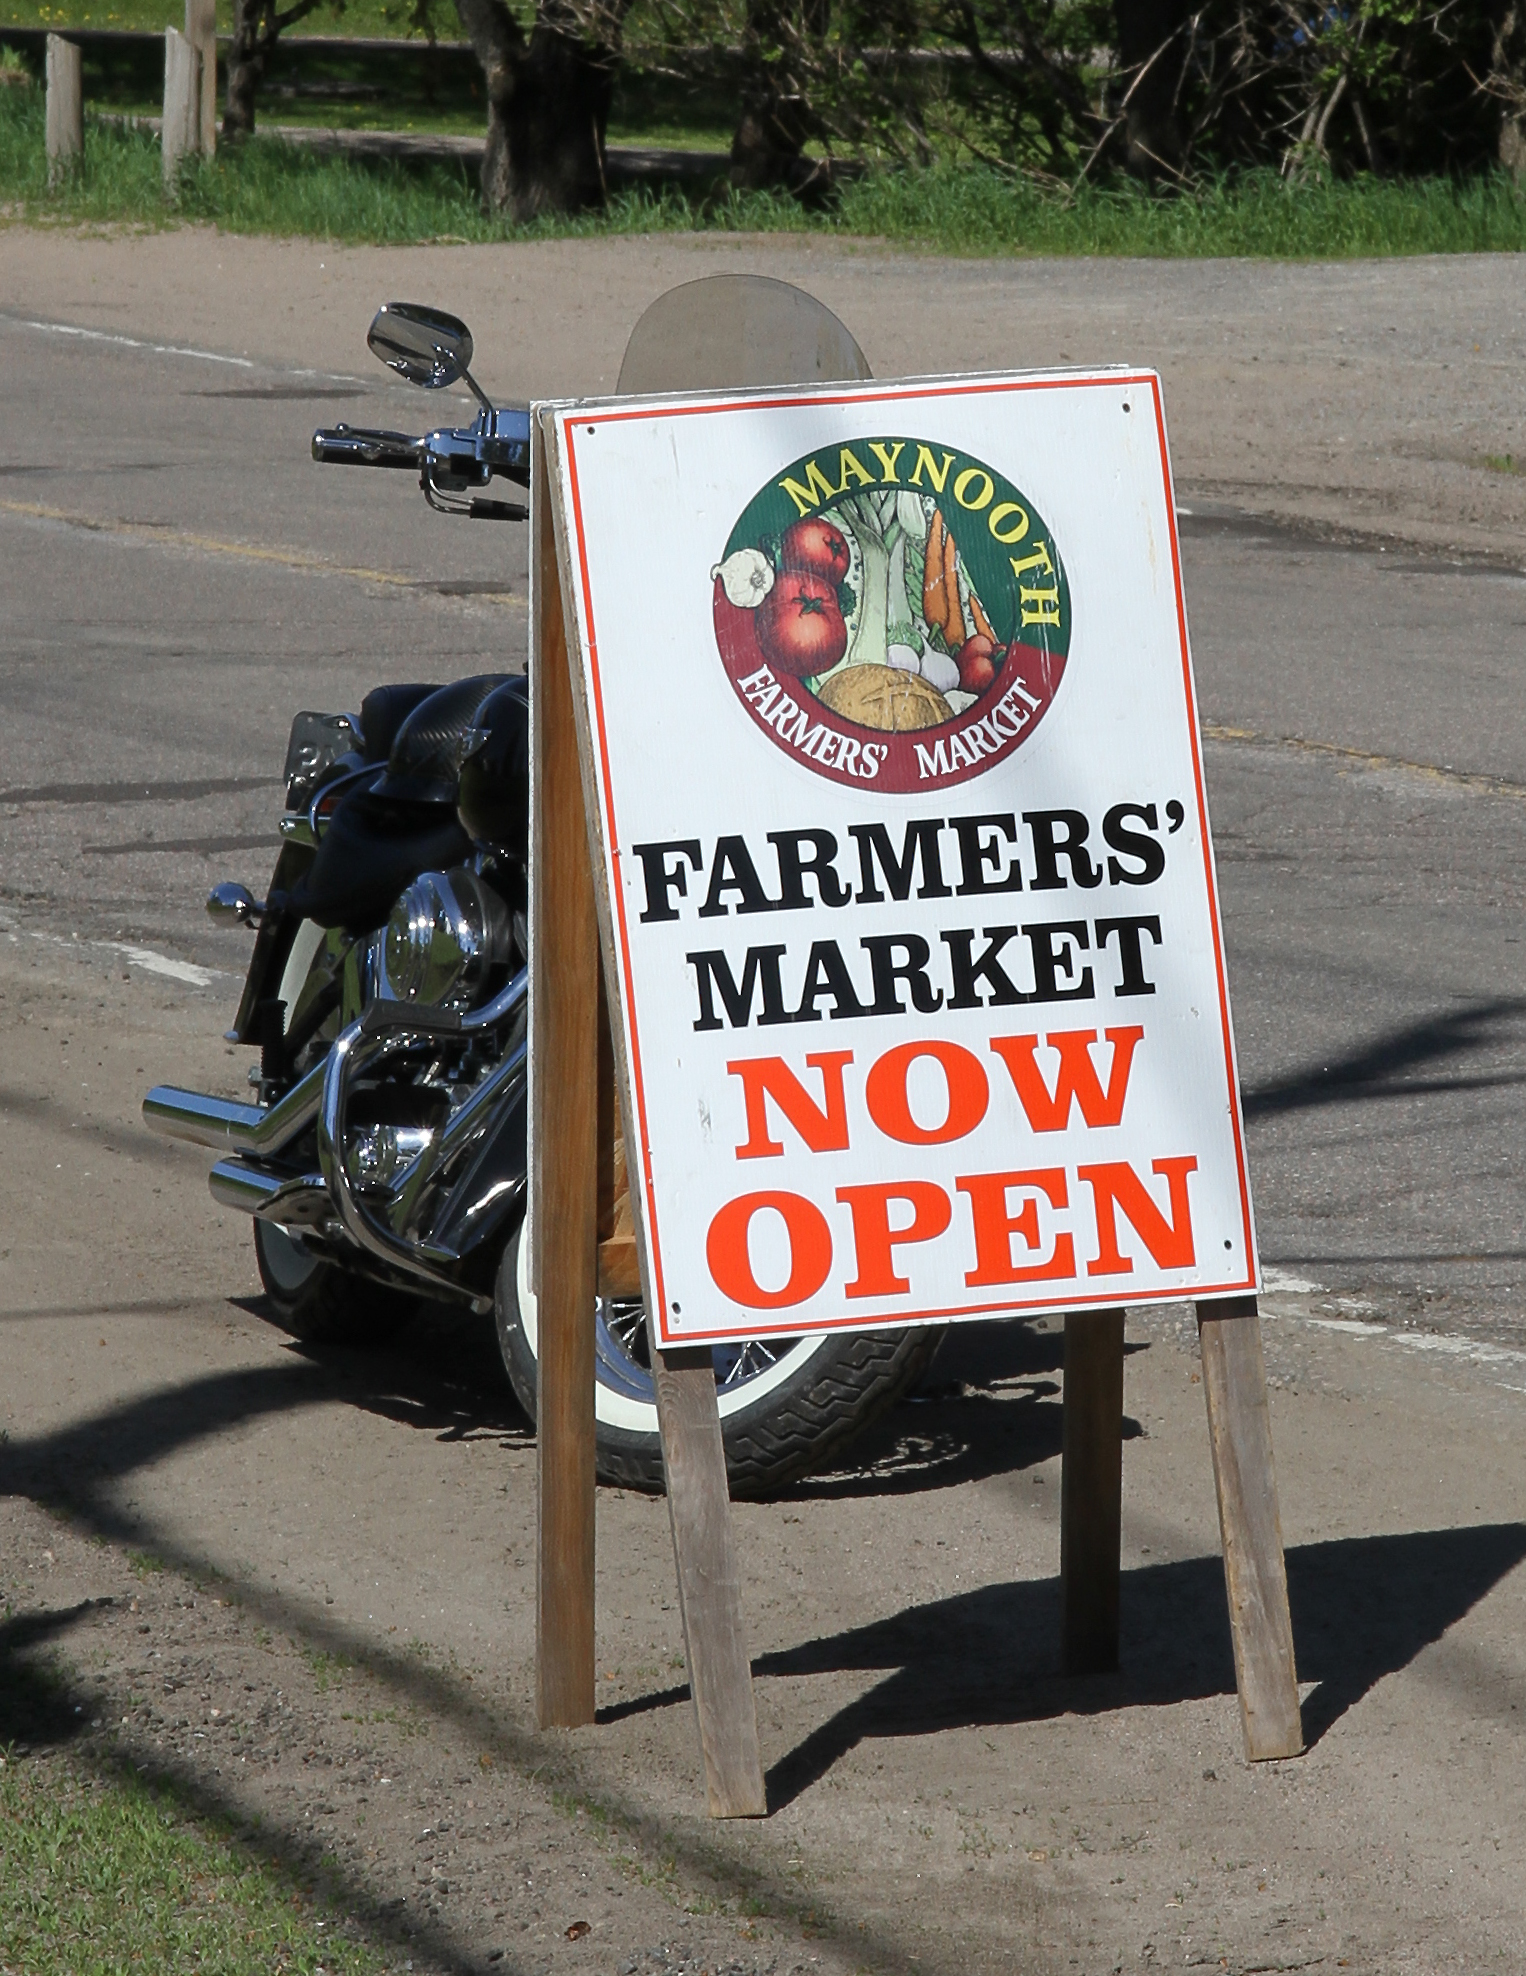 maynooth market